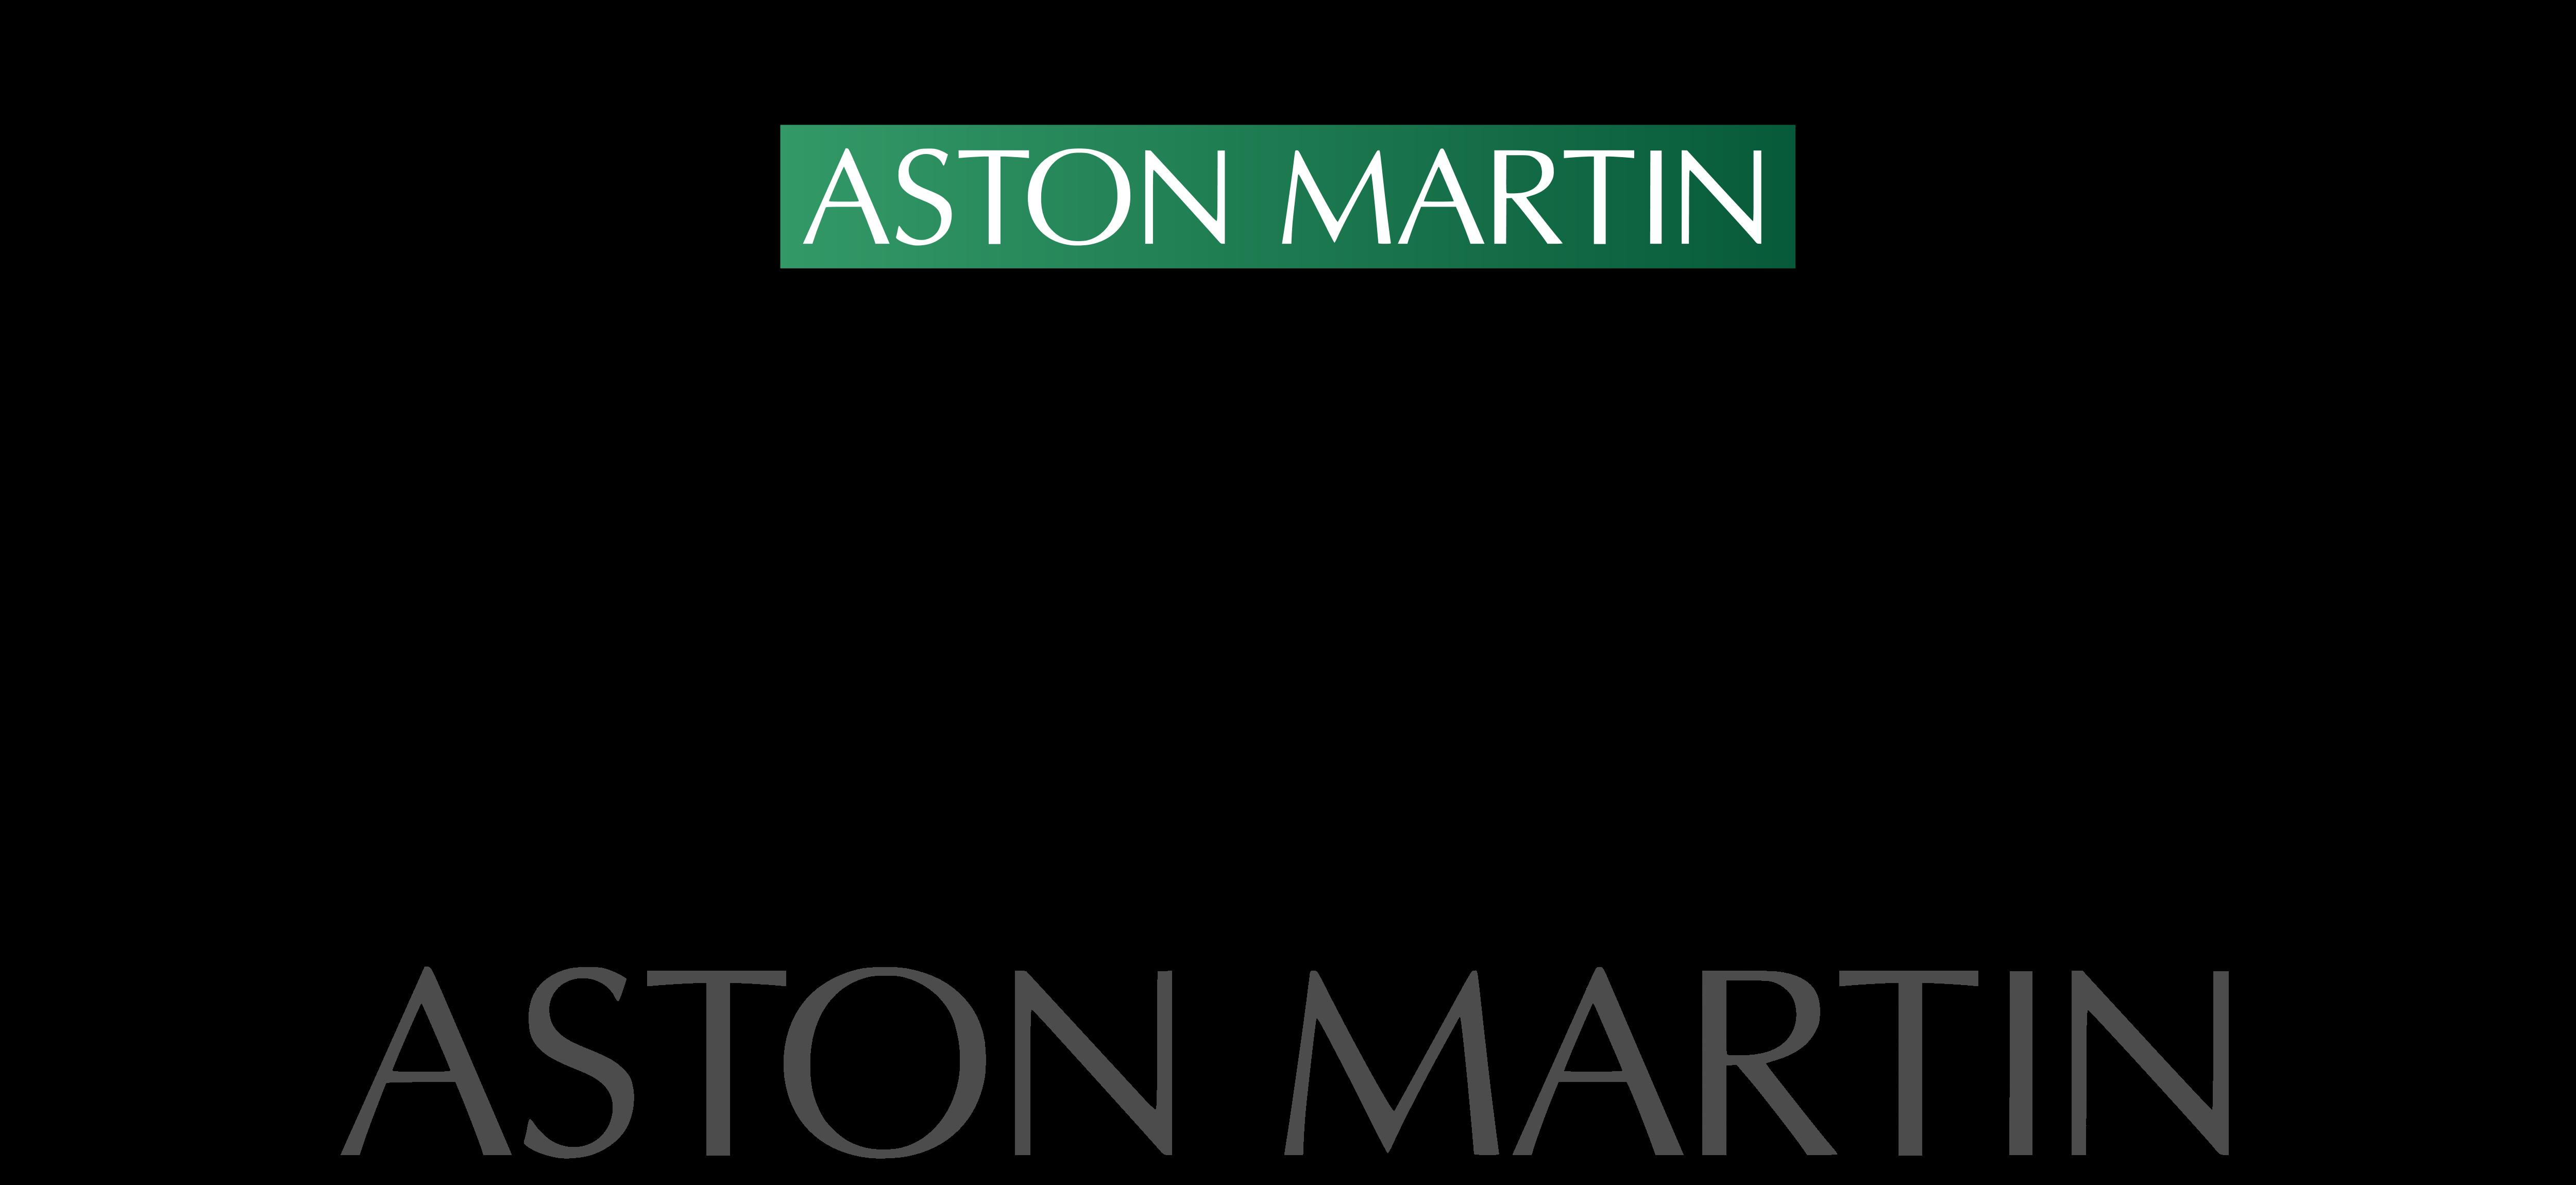 Daihatsu Badge >> Aston Martin – Logos Download